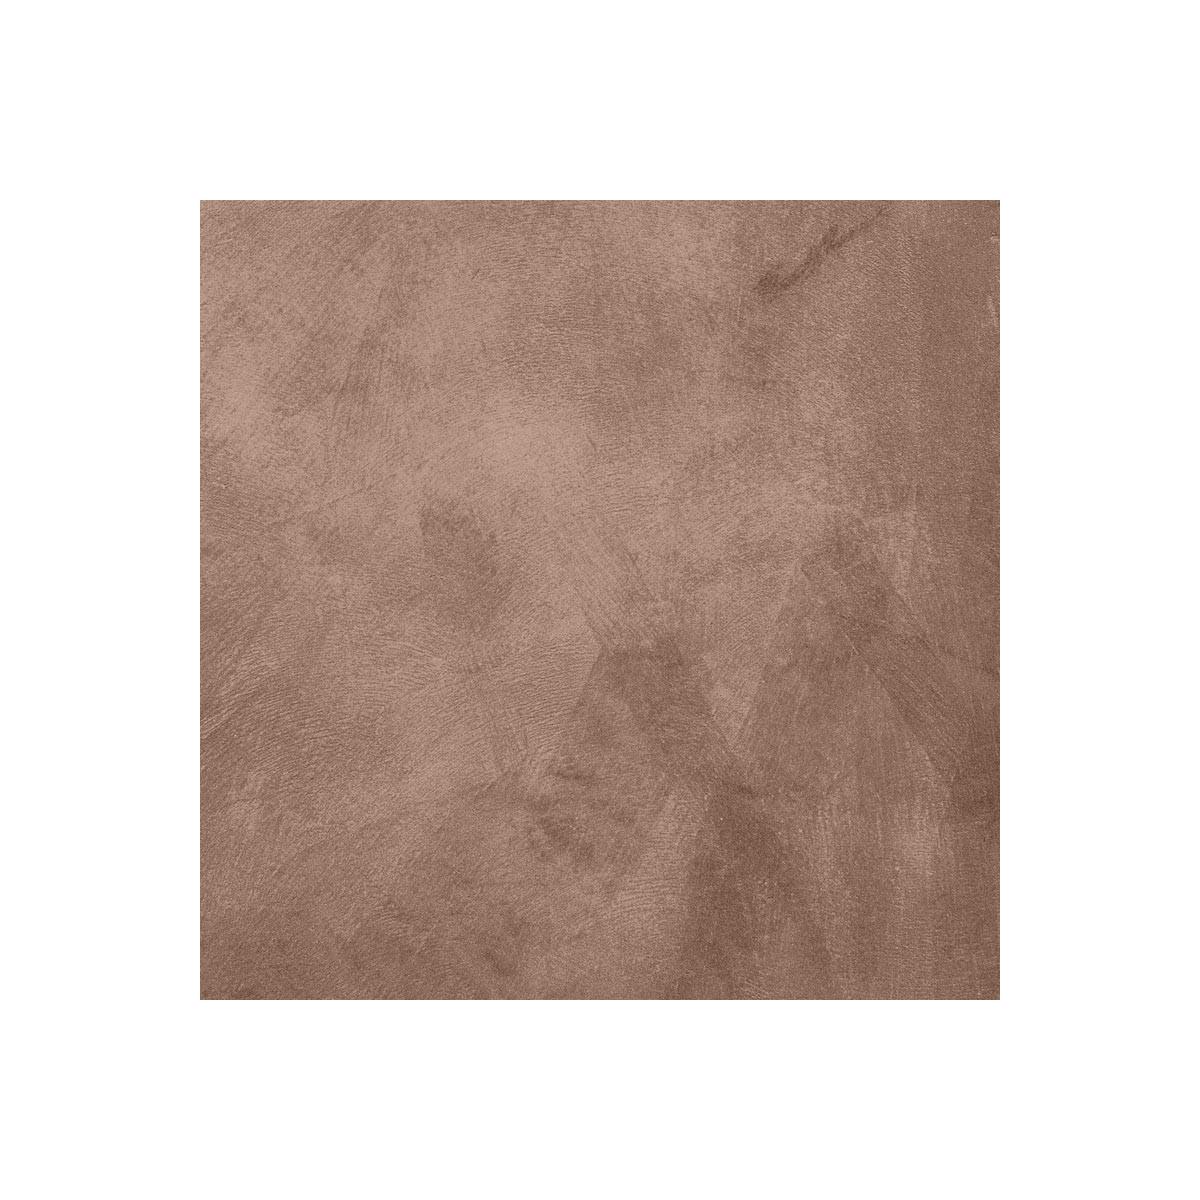 B ton cir sur carrelage cuisine salle de bain mural sol for Beton cire sur carrelage